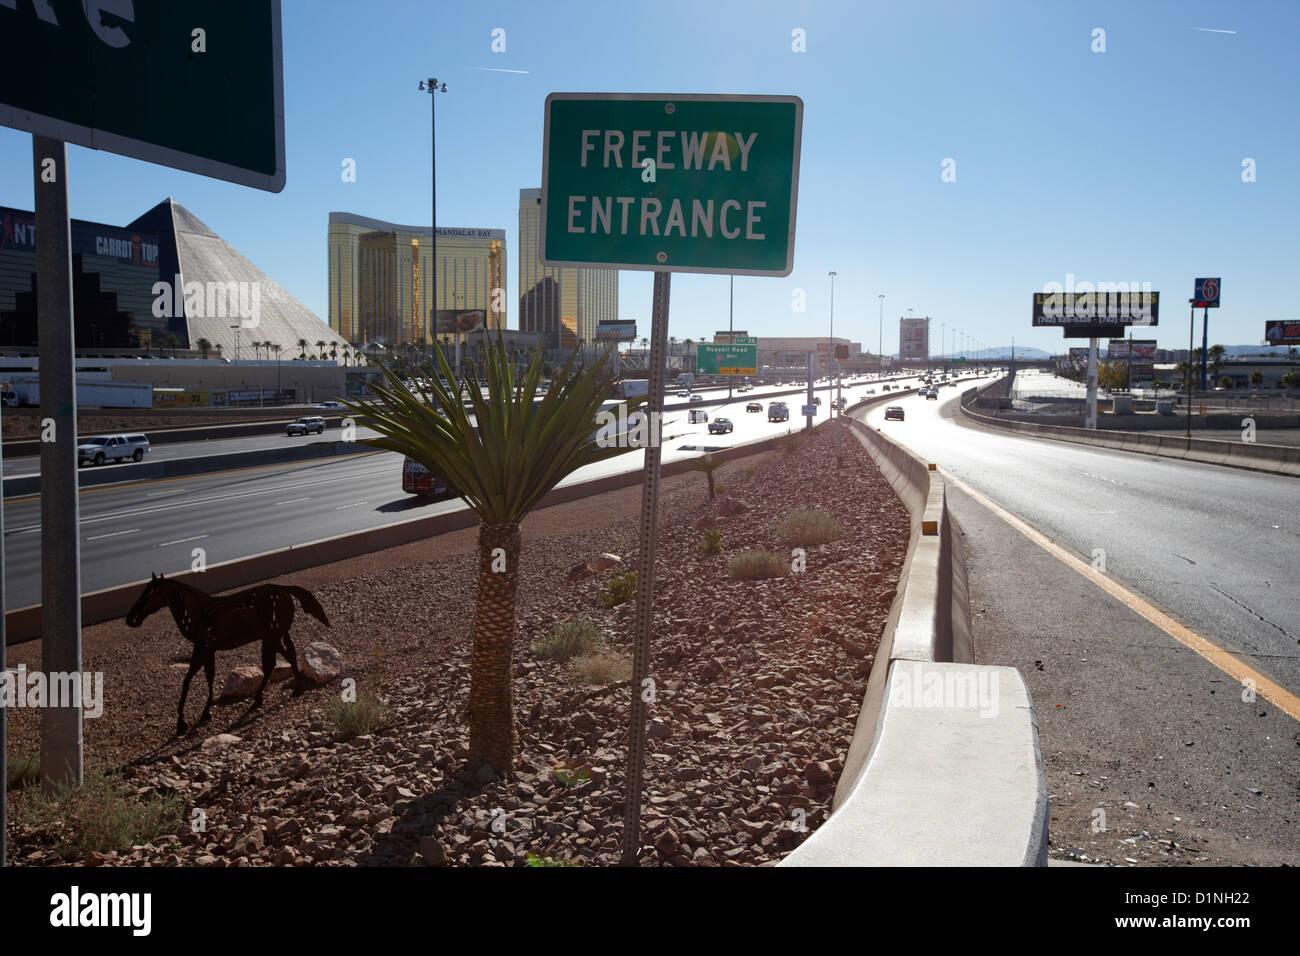 'Autostrada i-15 in strada di ingresso Las Vegas Nevada USA Immagini Stock